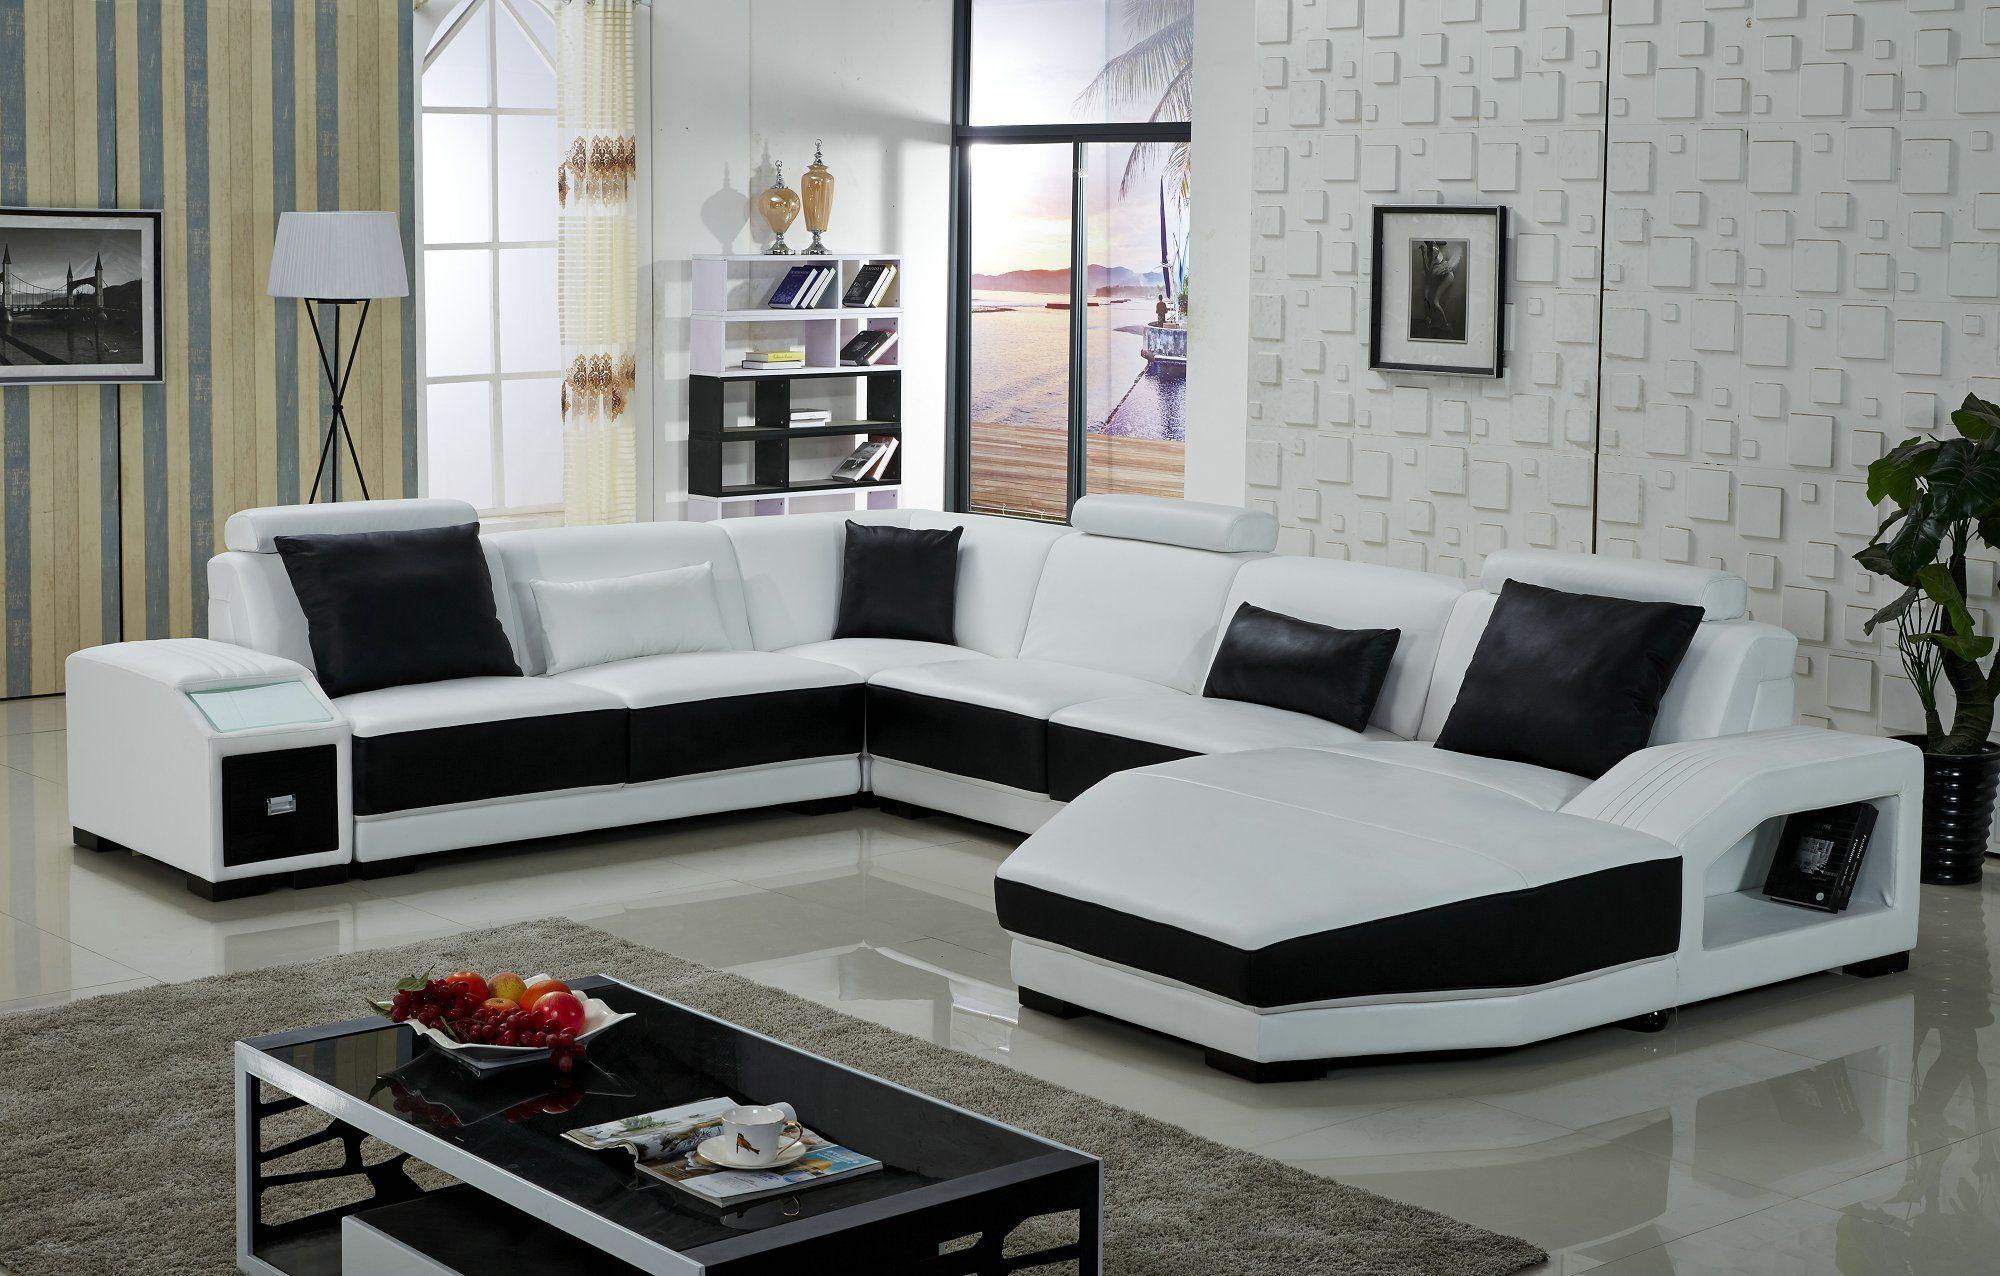 Contemporary Sofa Sets L BZ1204 1 China Lizz Furniture Co Ltd